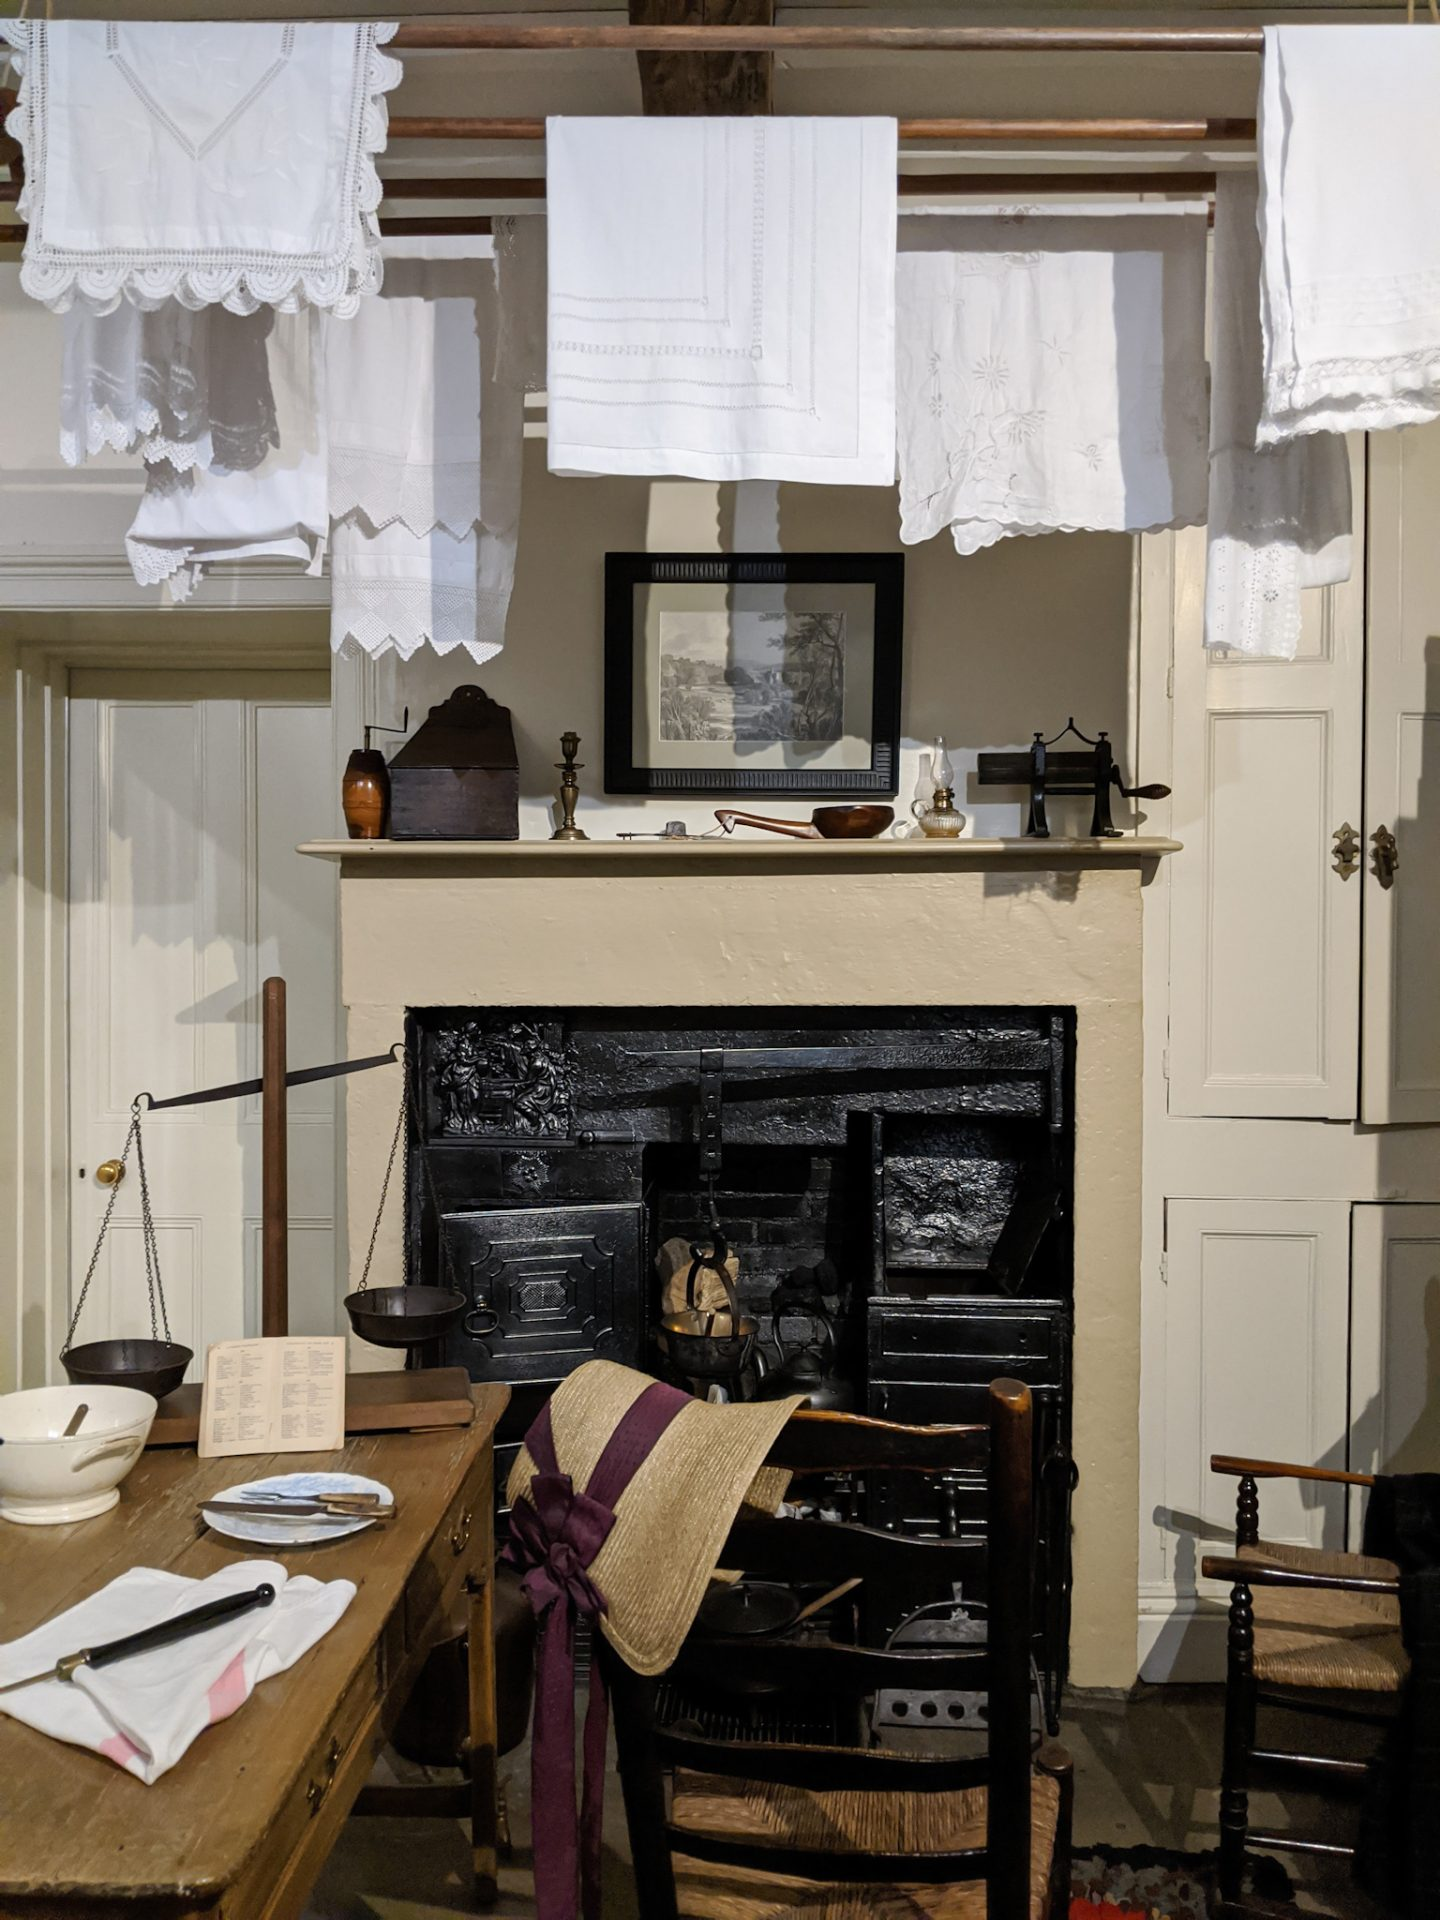 The Brontë Parsonage Museum Kitchen